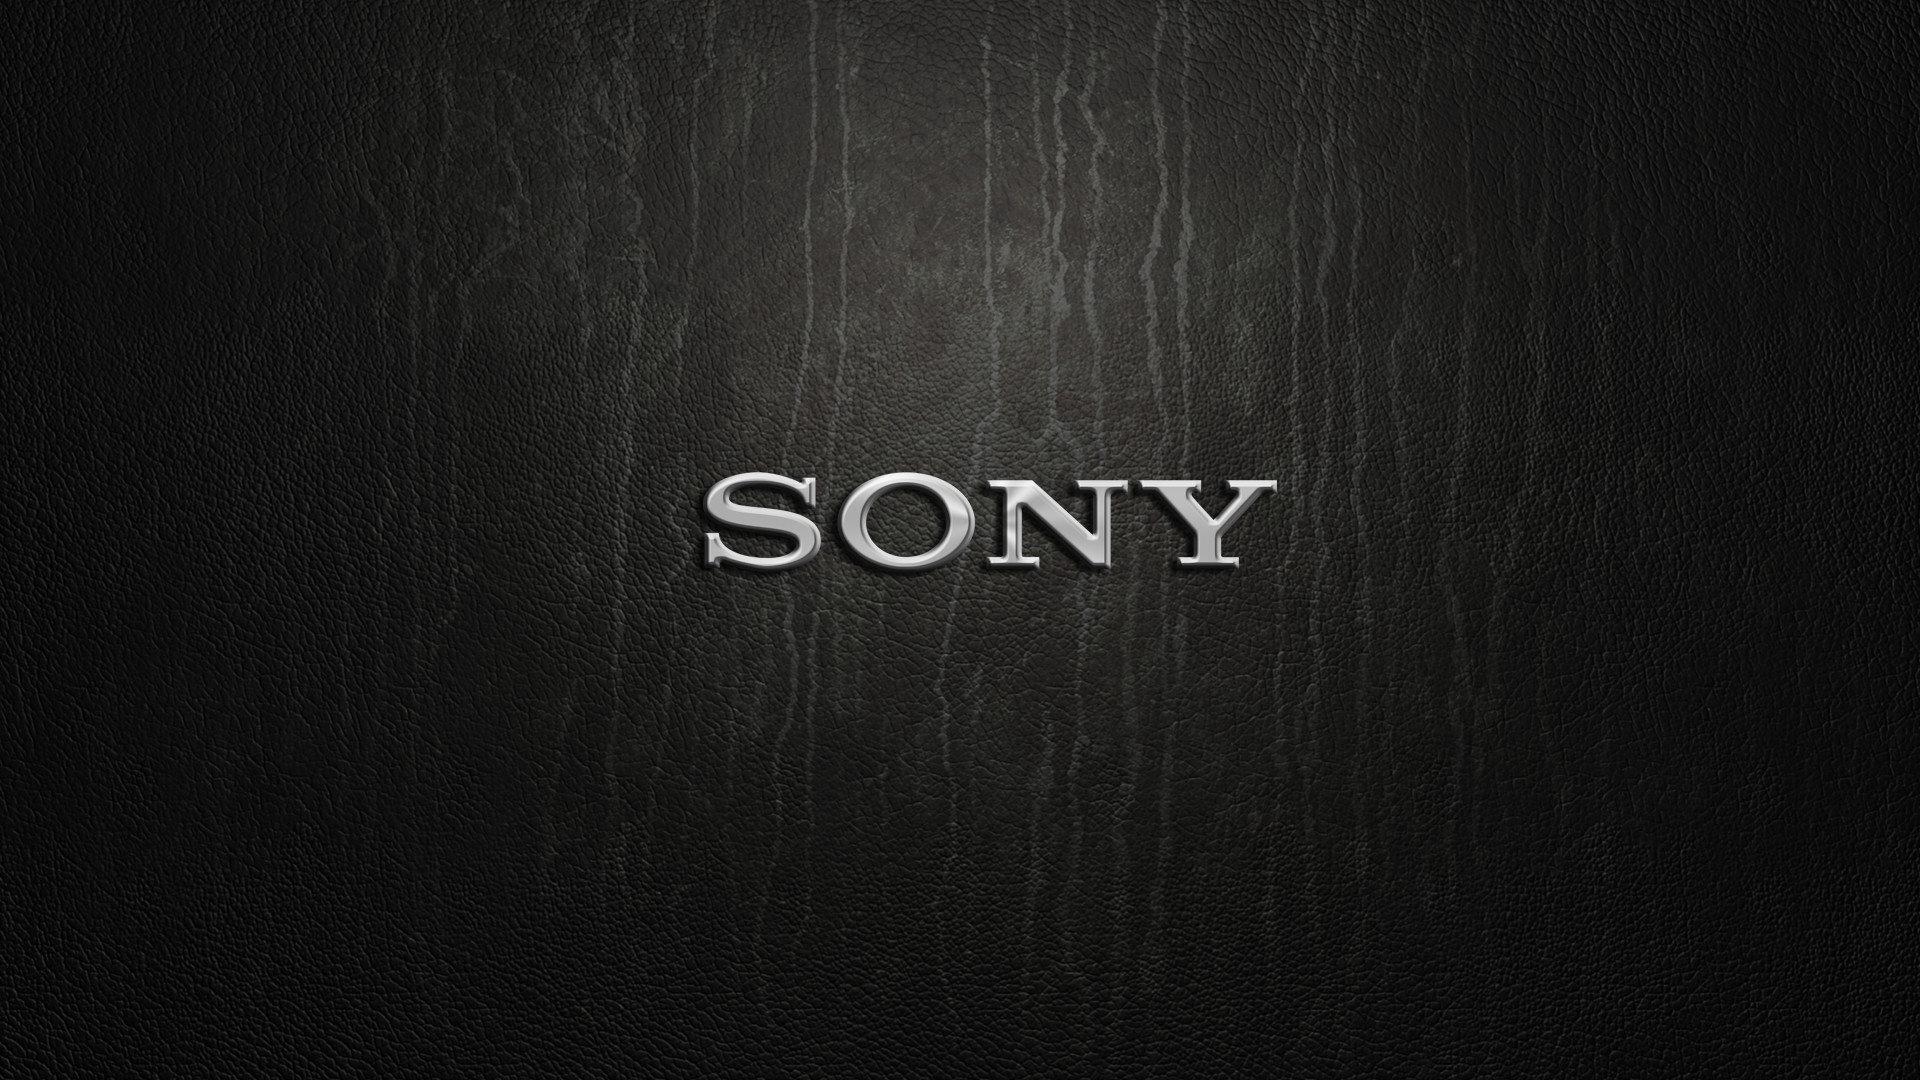 Sony Background